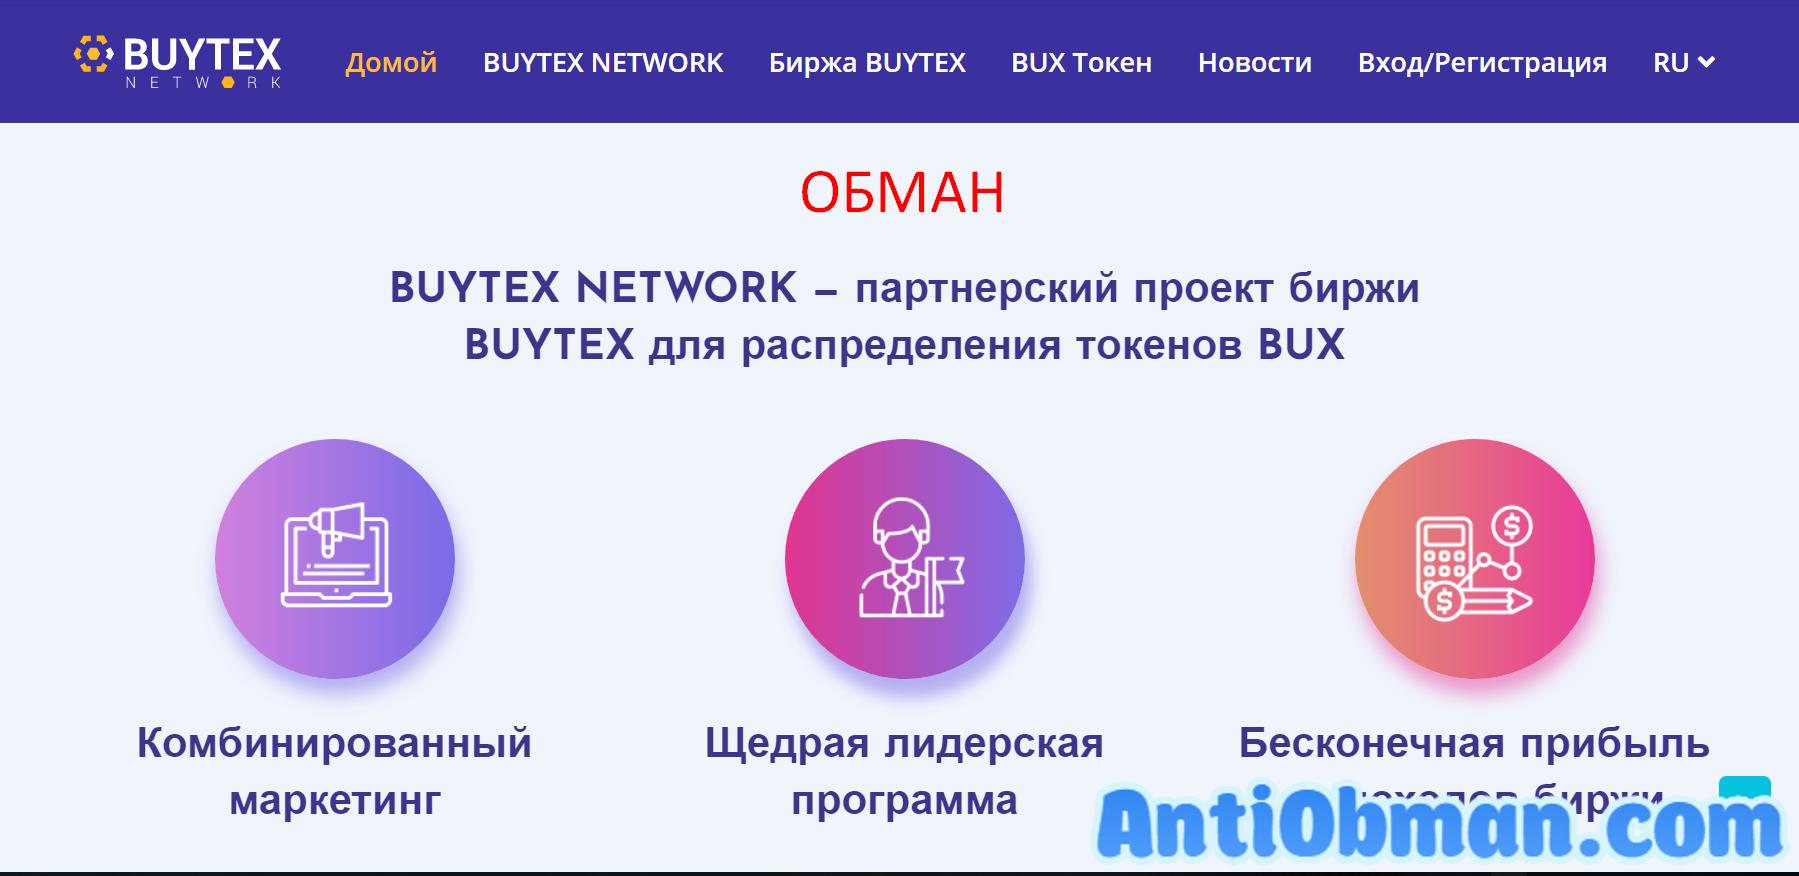 Buytex Network - отзывы и обзор buytex.net. Биржа, развод лохотрон?